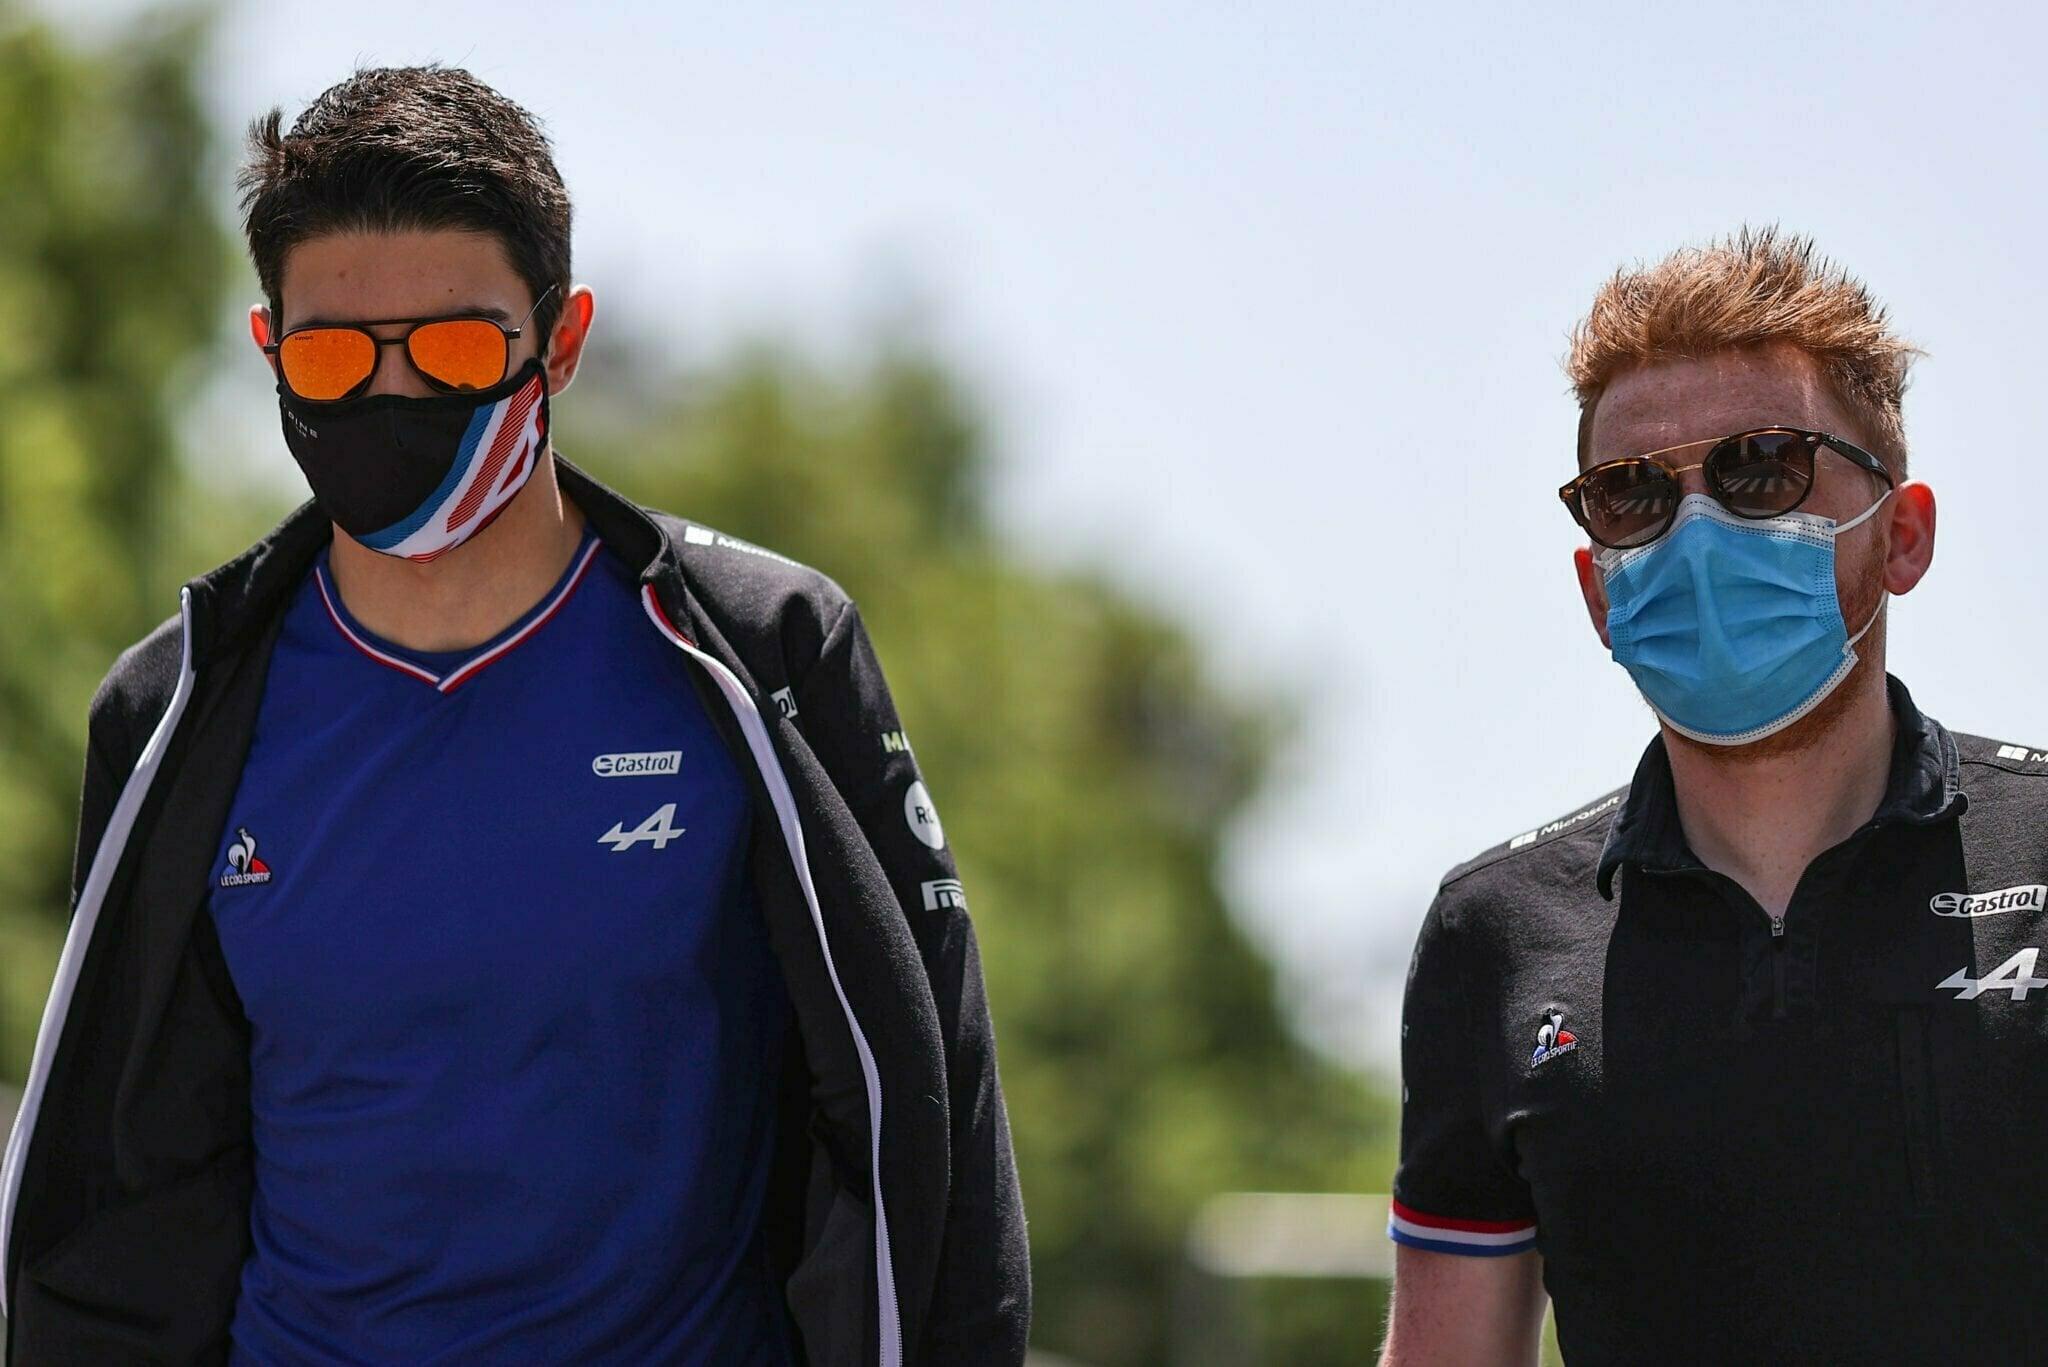 Alpine F1 Azerbaijan Grand Prix Baku Alonso Ocon 2021